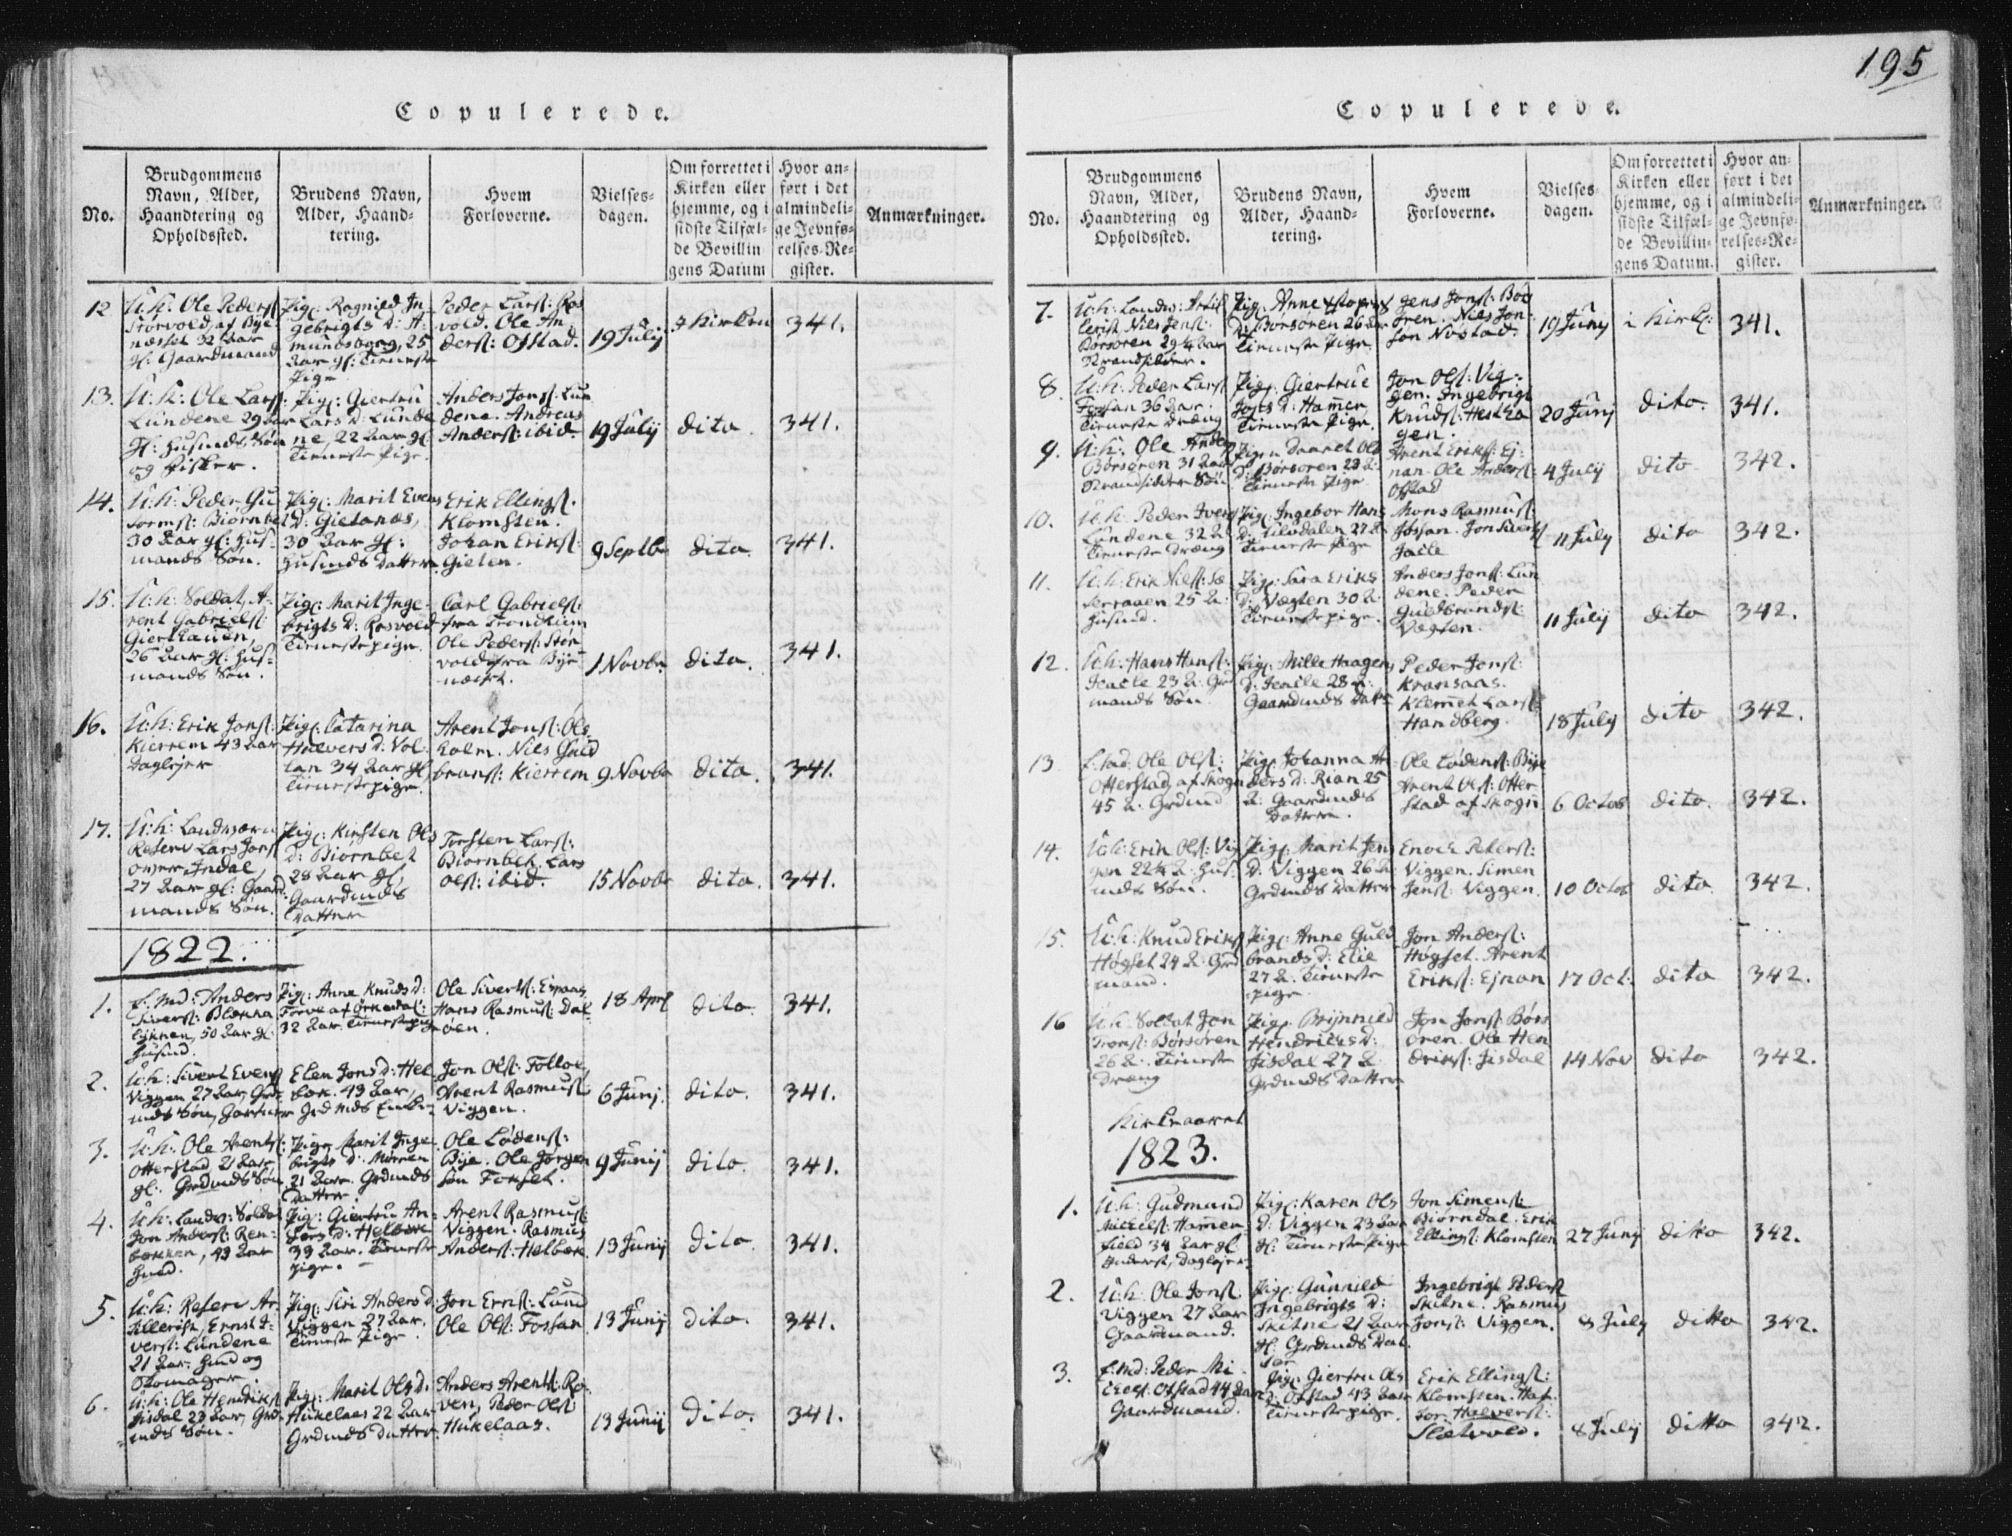 SAT, Ministerialprotokoller, klokkerbøker og fødselsregistre - Sør-Trøndelag, 665/L0770: Parish register (official) no. 665A05, 1817-1829, p. 195